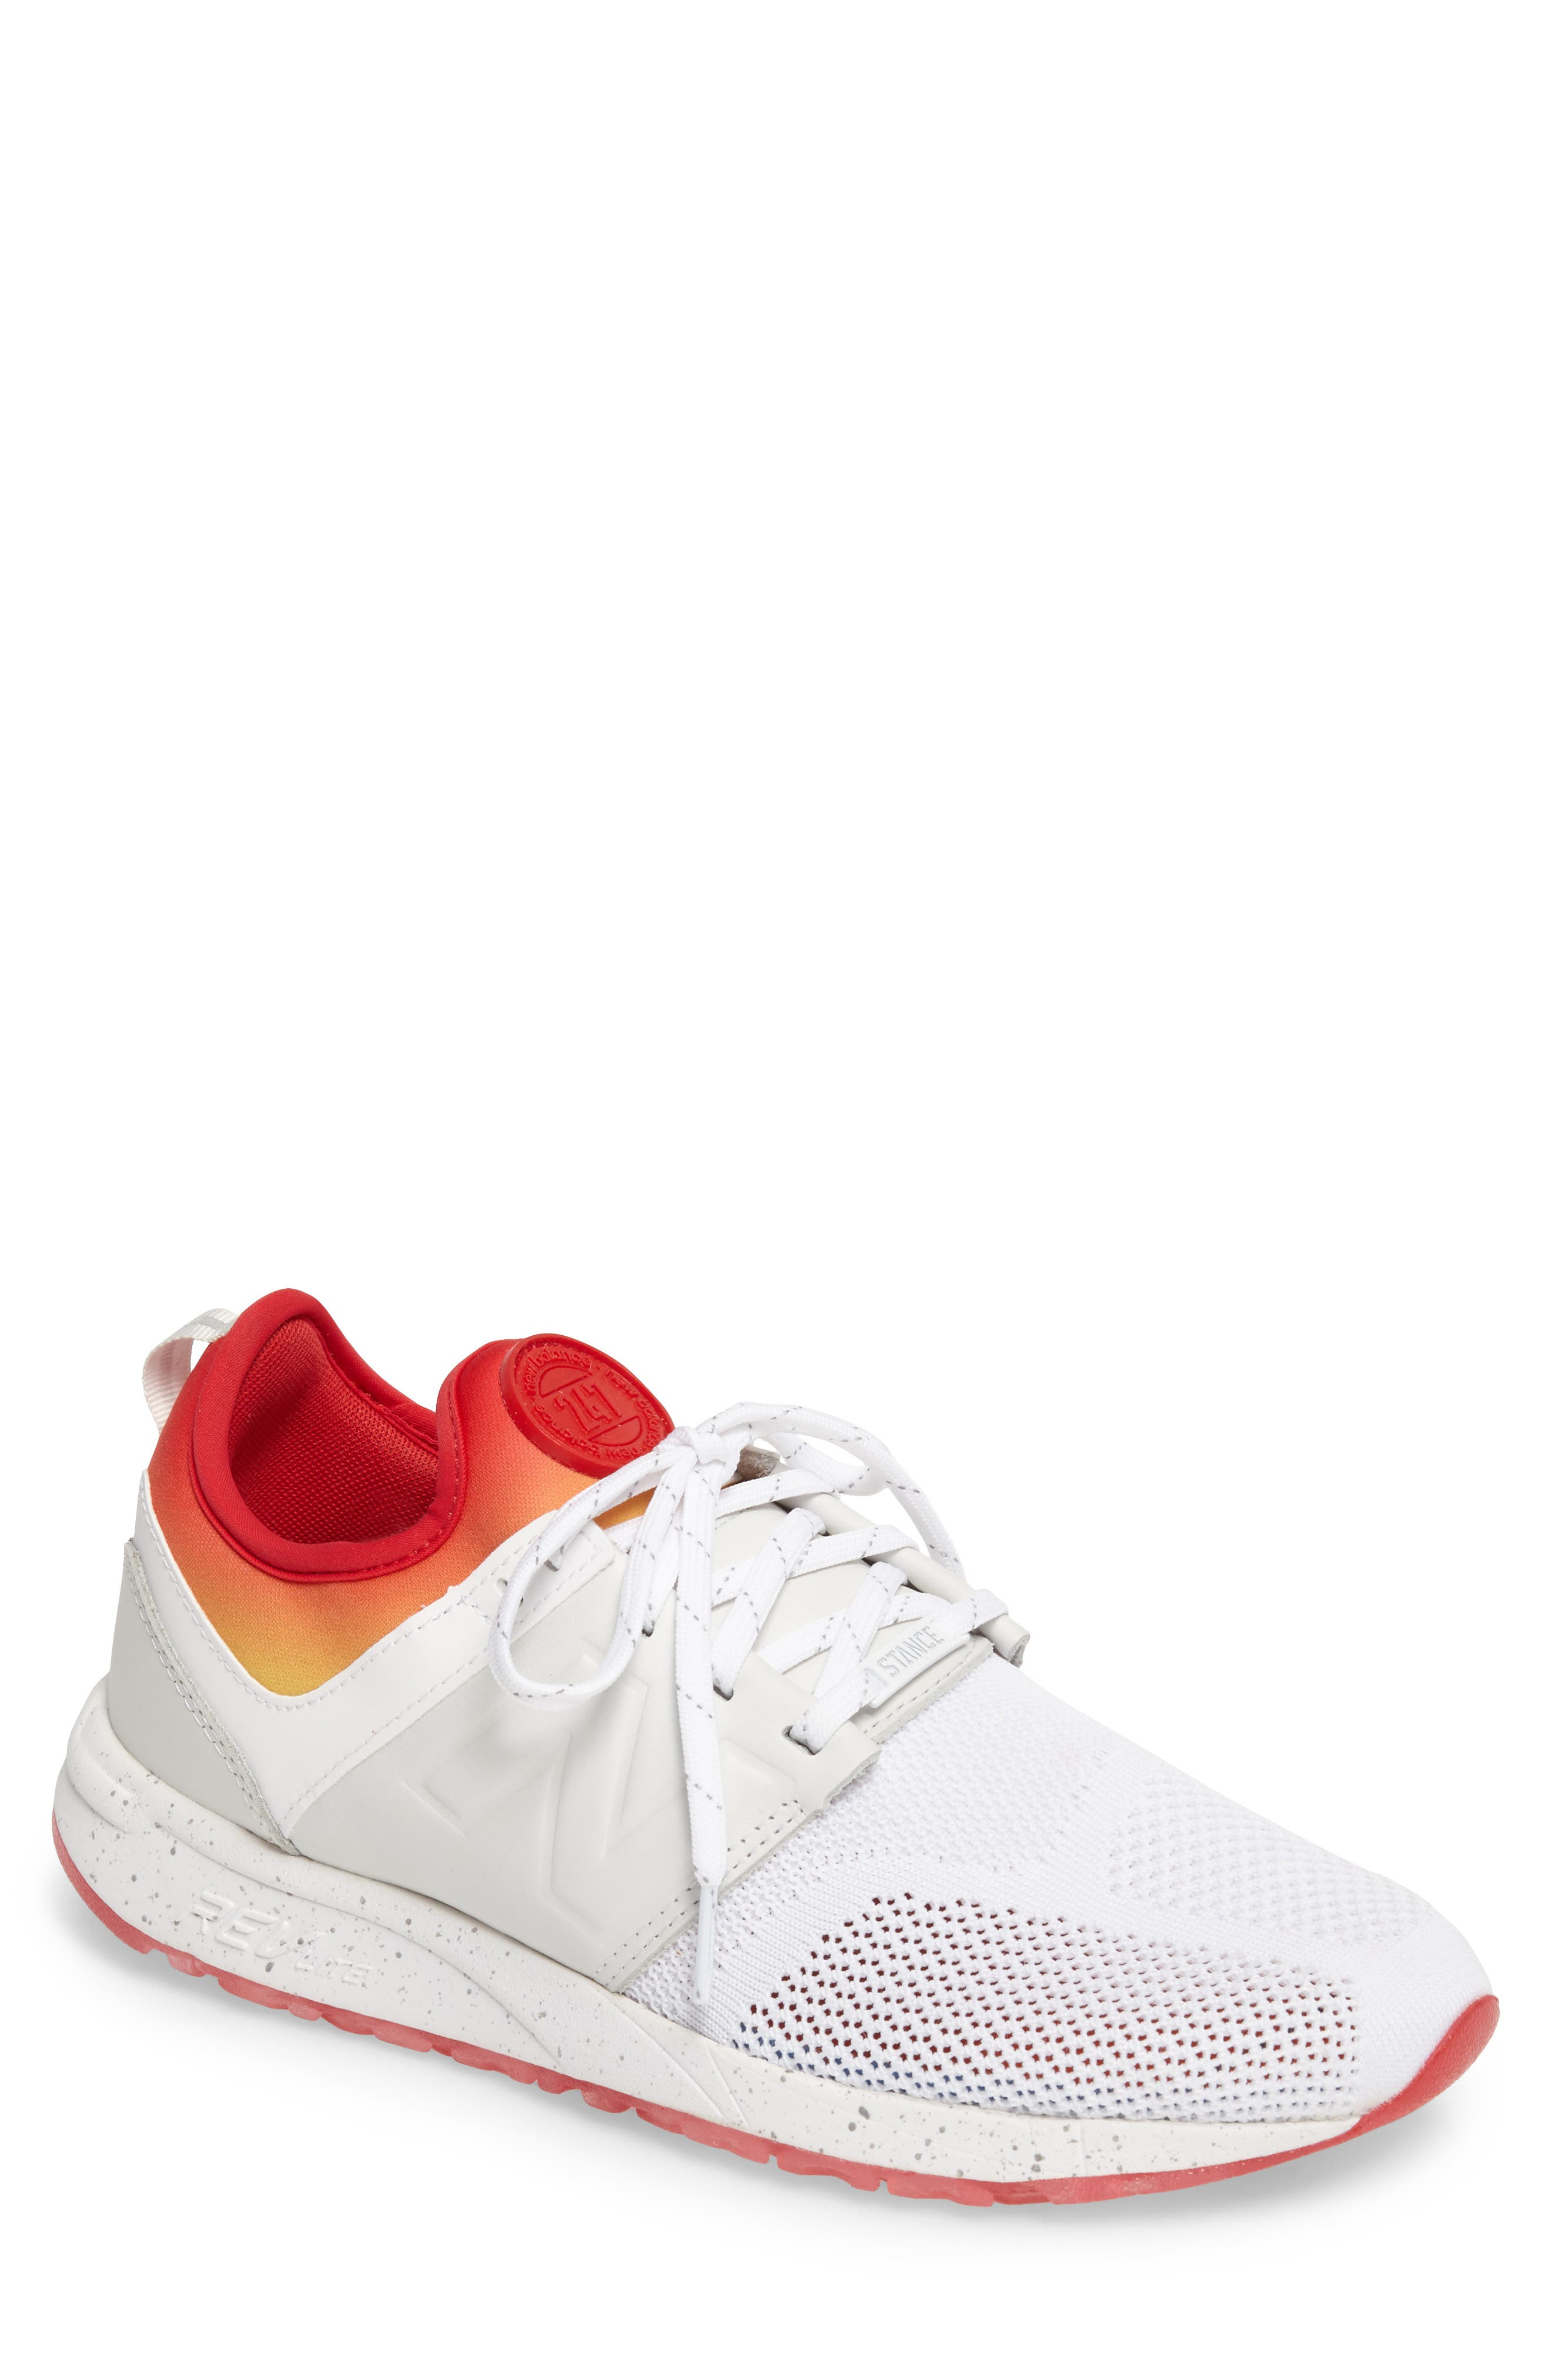 New Balance x Stance 237 Sneaker (Men)